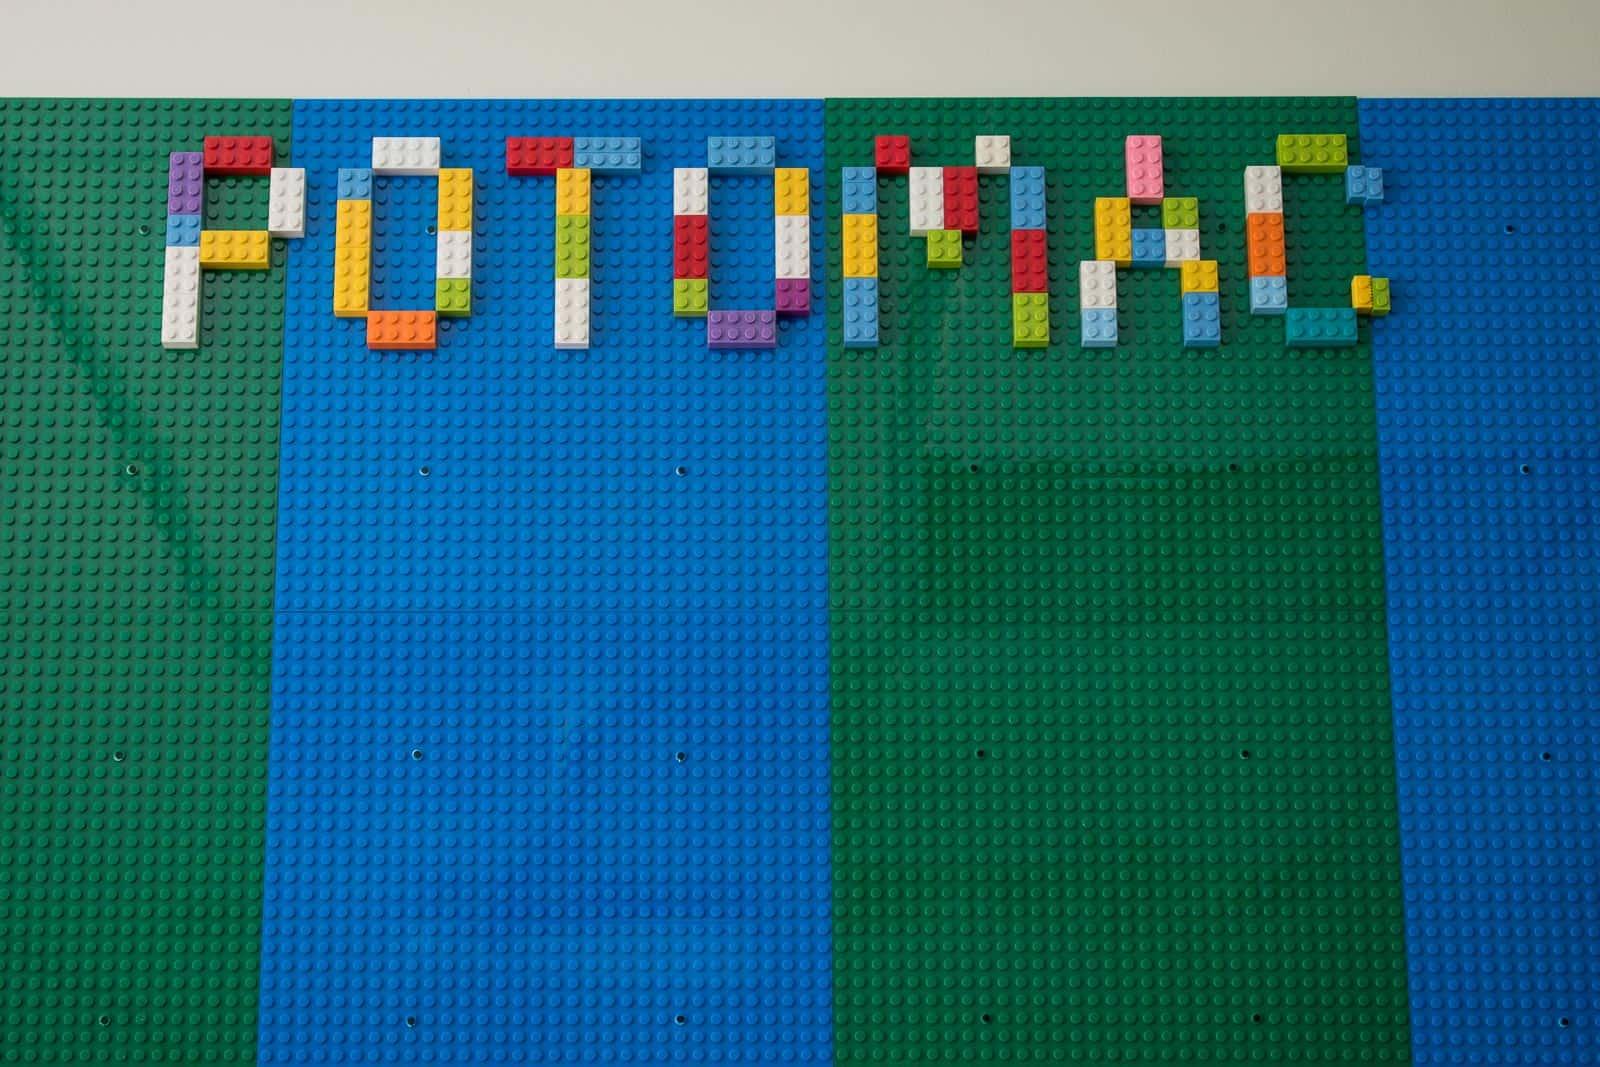 vertical lego wall in school classroom